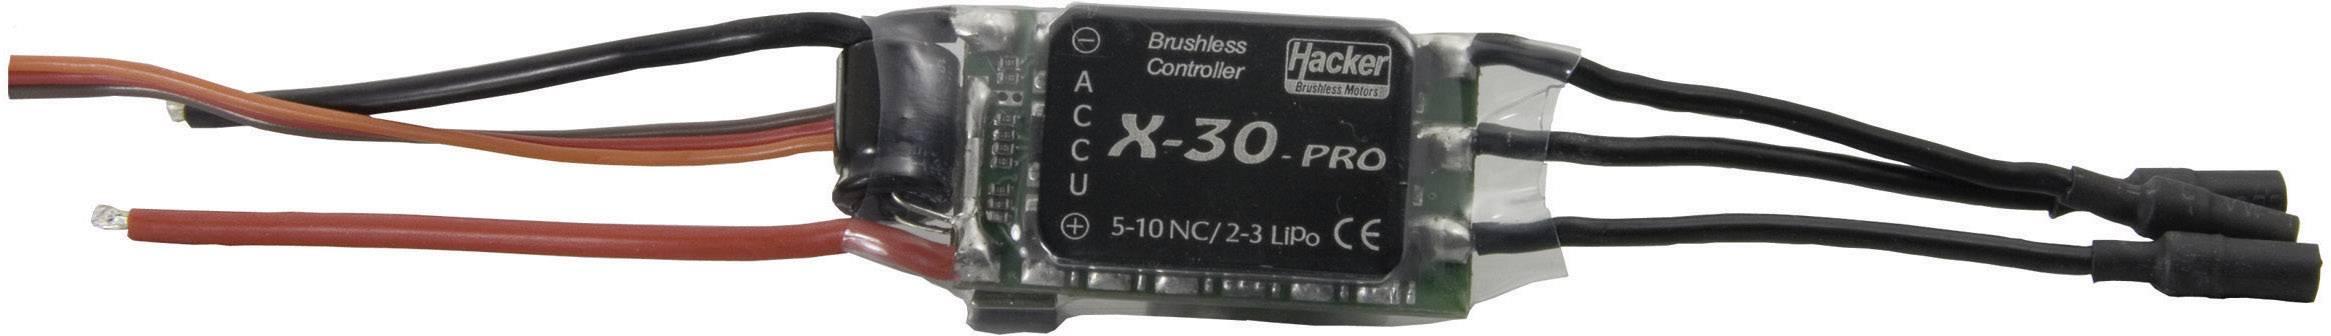 Brushless letový regulátor pre model lietadla Hacker X-30-Pro BEC